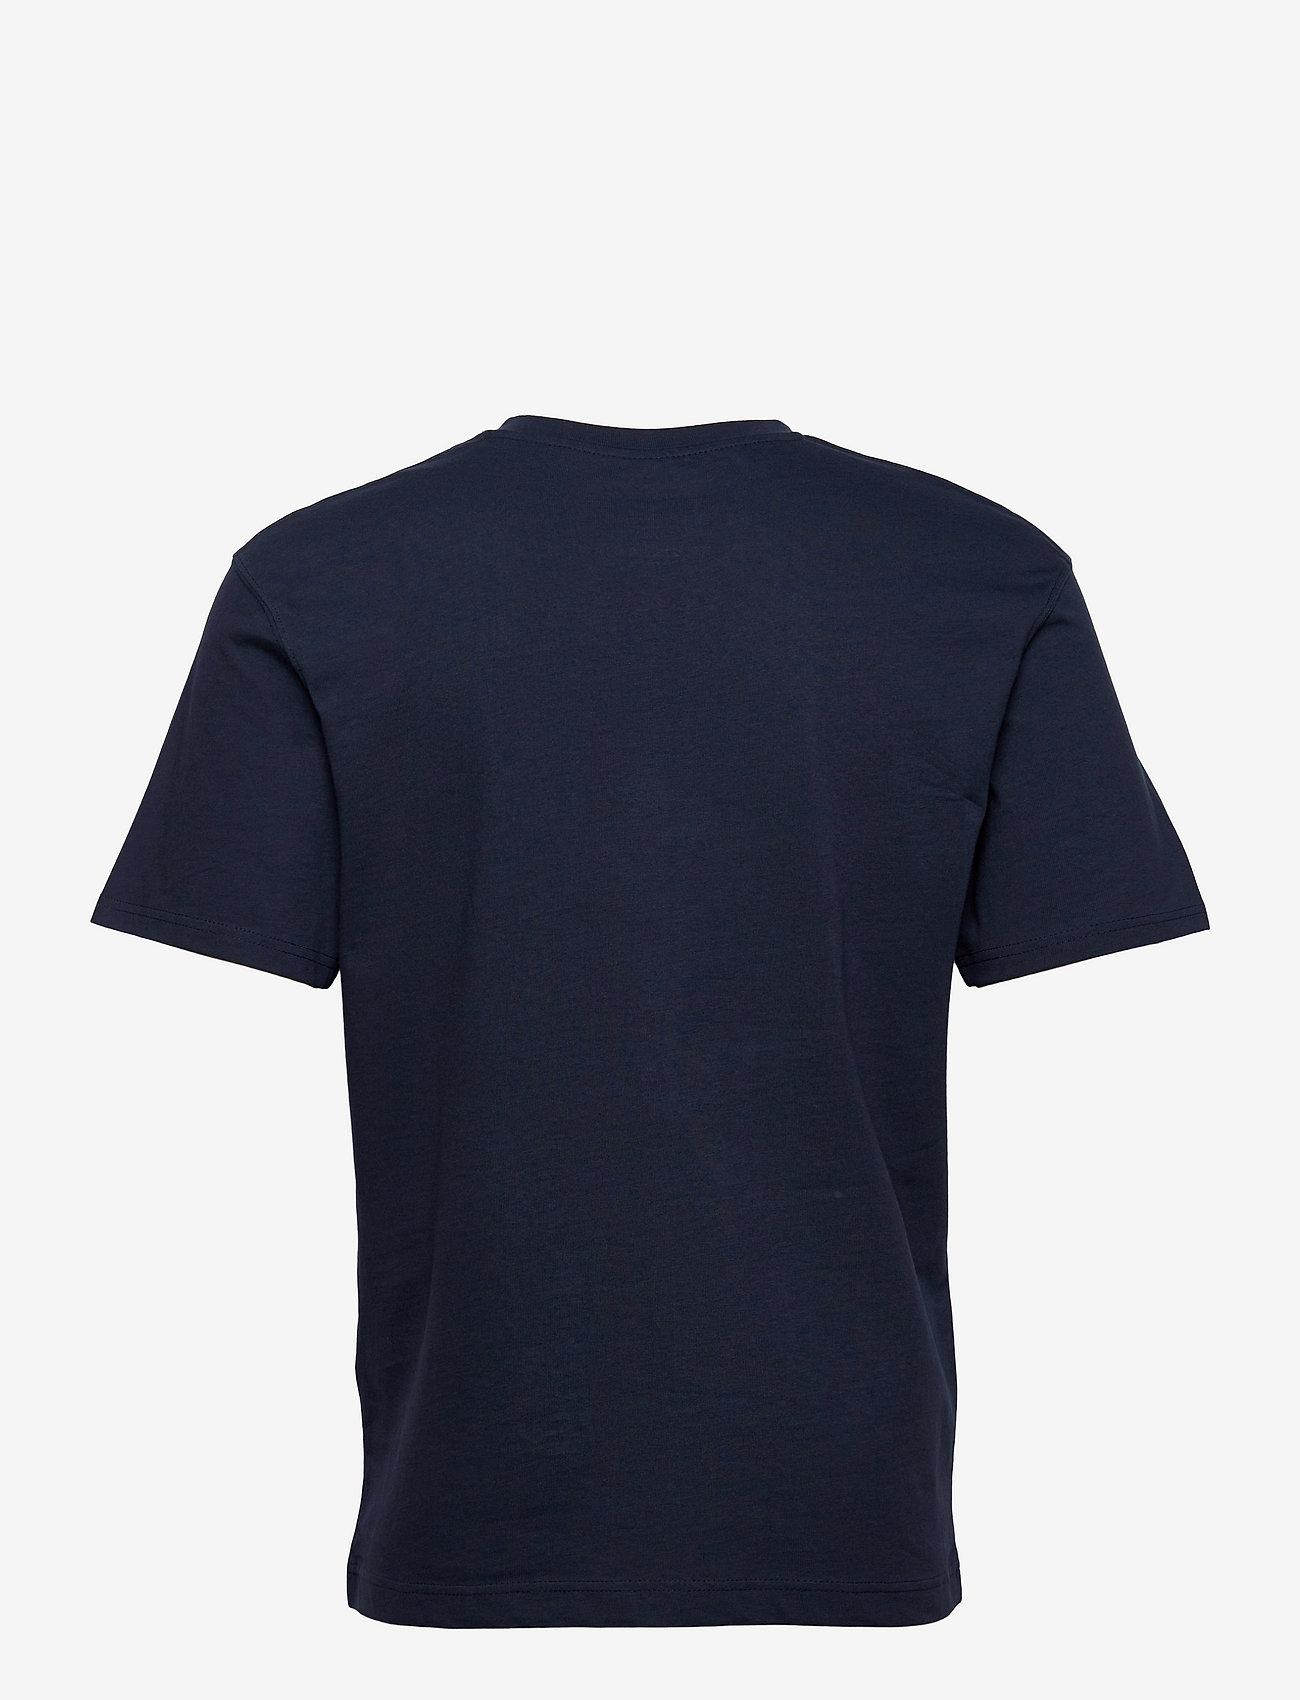 Jack & Jones - JJERELAXED TEE SS O-NECK - basic t-shirts - navy blazer - 1